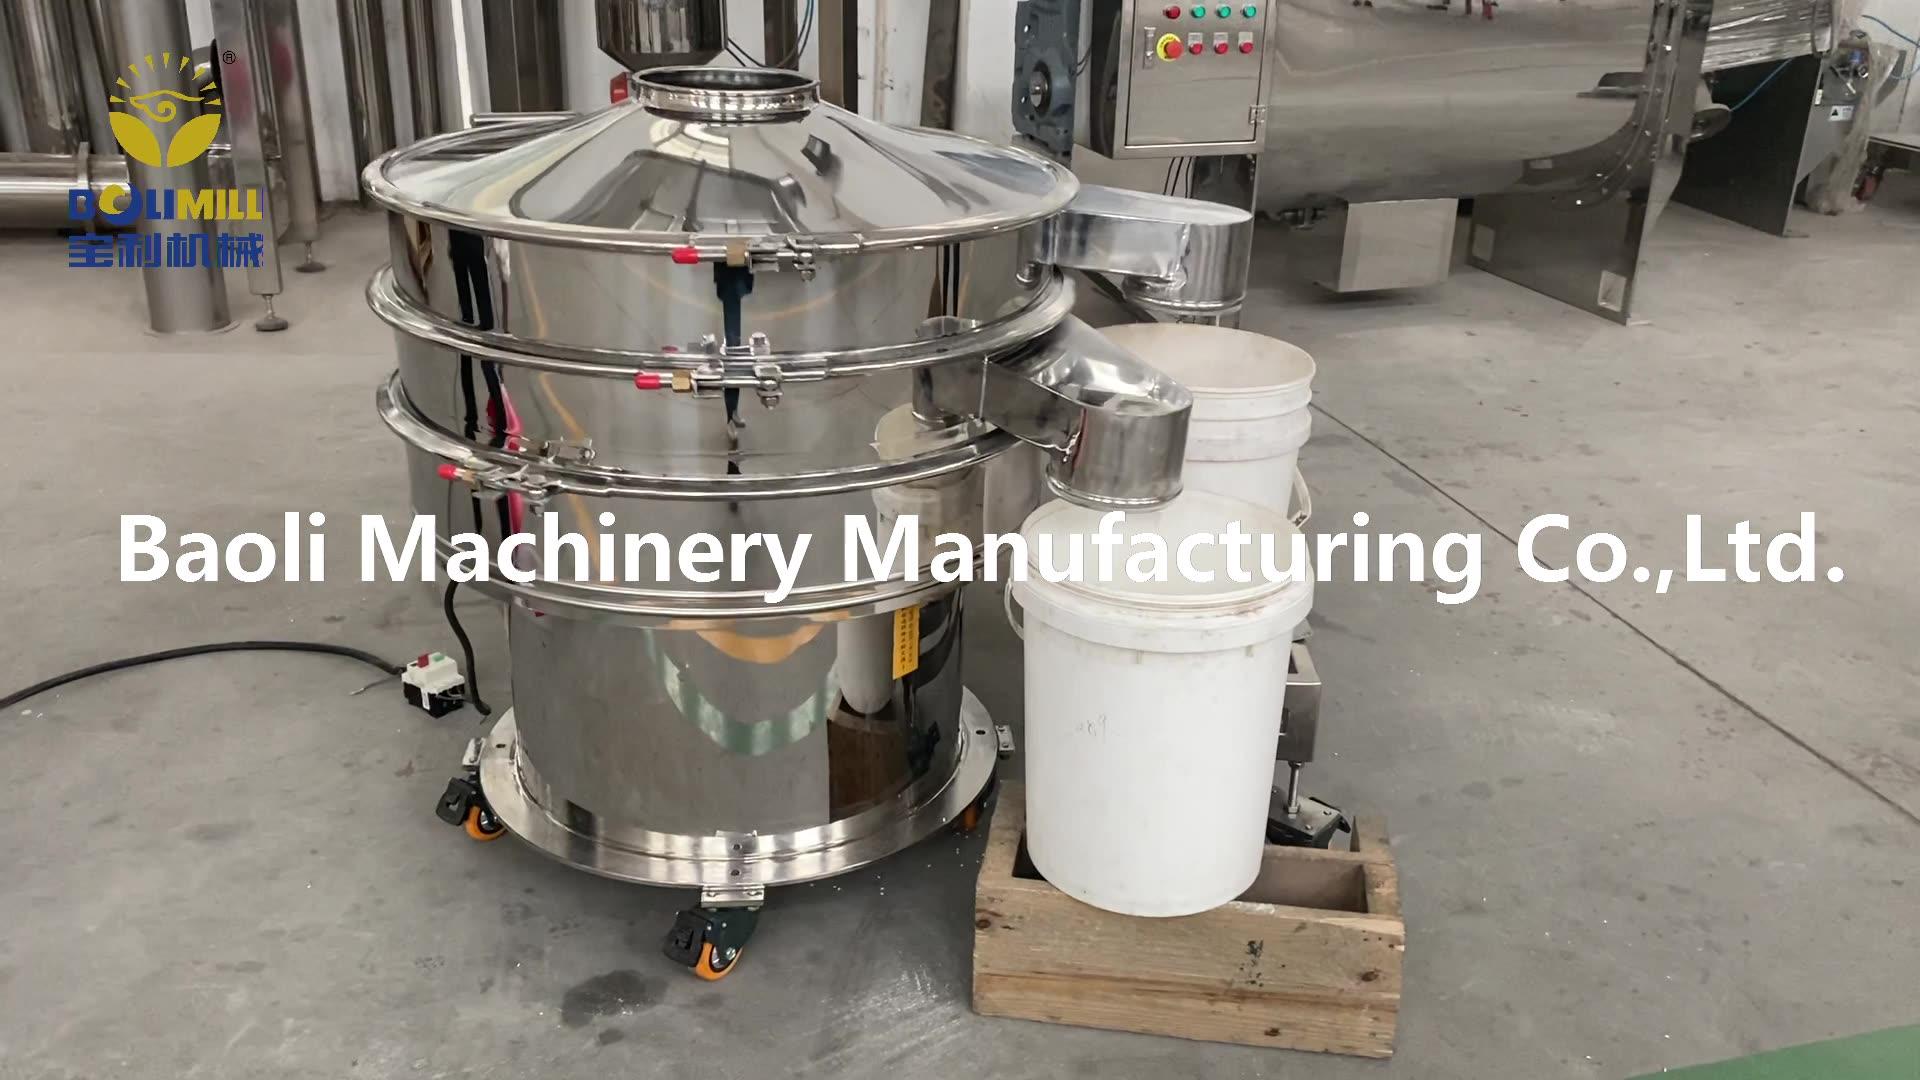 उच्च दक्षता रासायनिक पाउडर हिल sifting मशीन